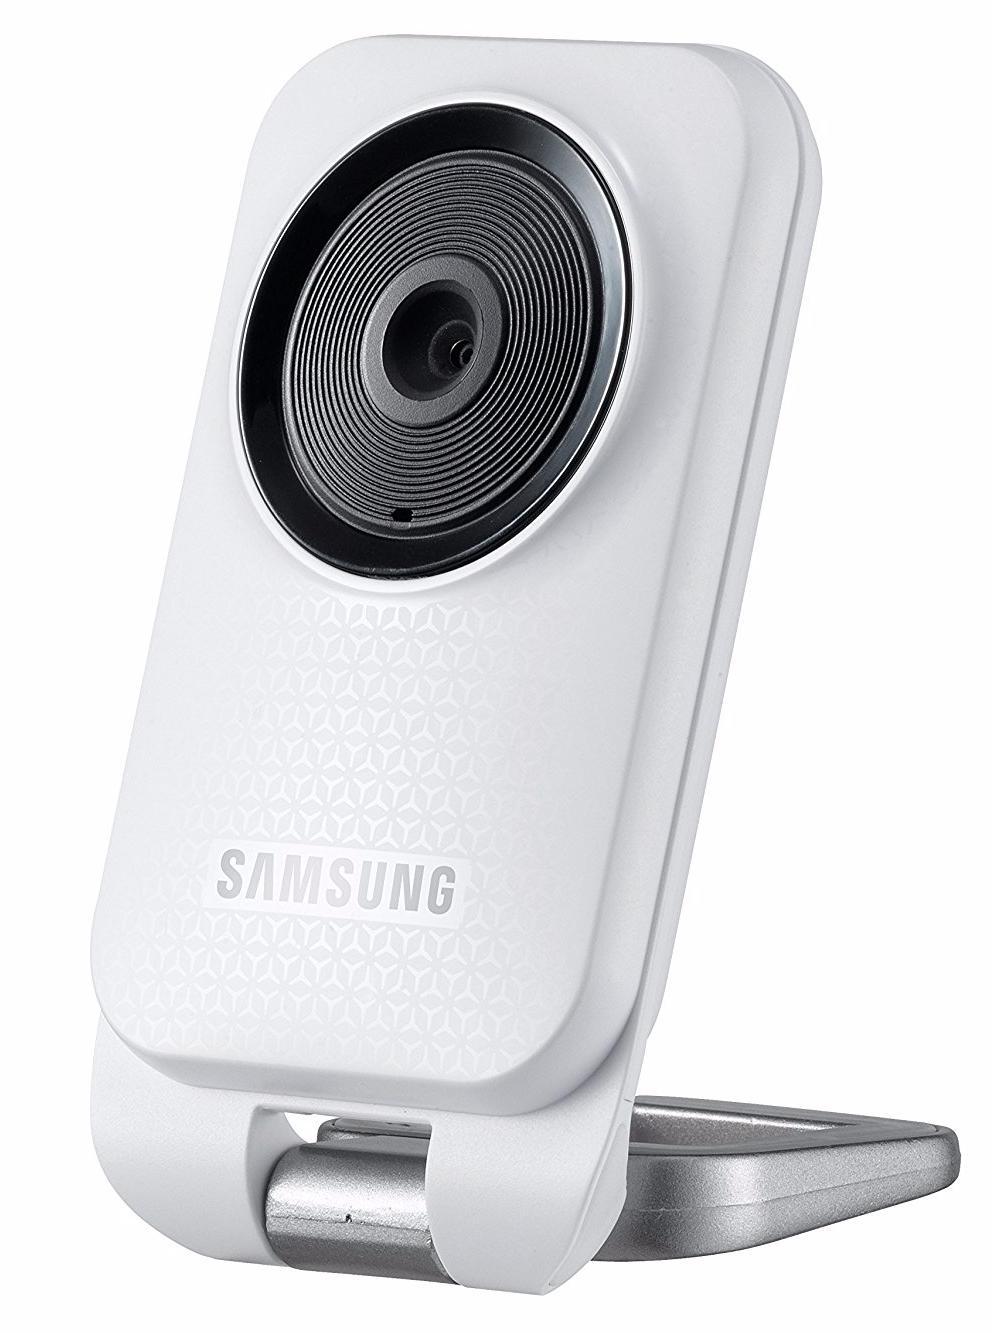 Samsung SmartCam (SNH-V6110BN) - беспроводная видеоняня (White)